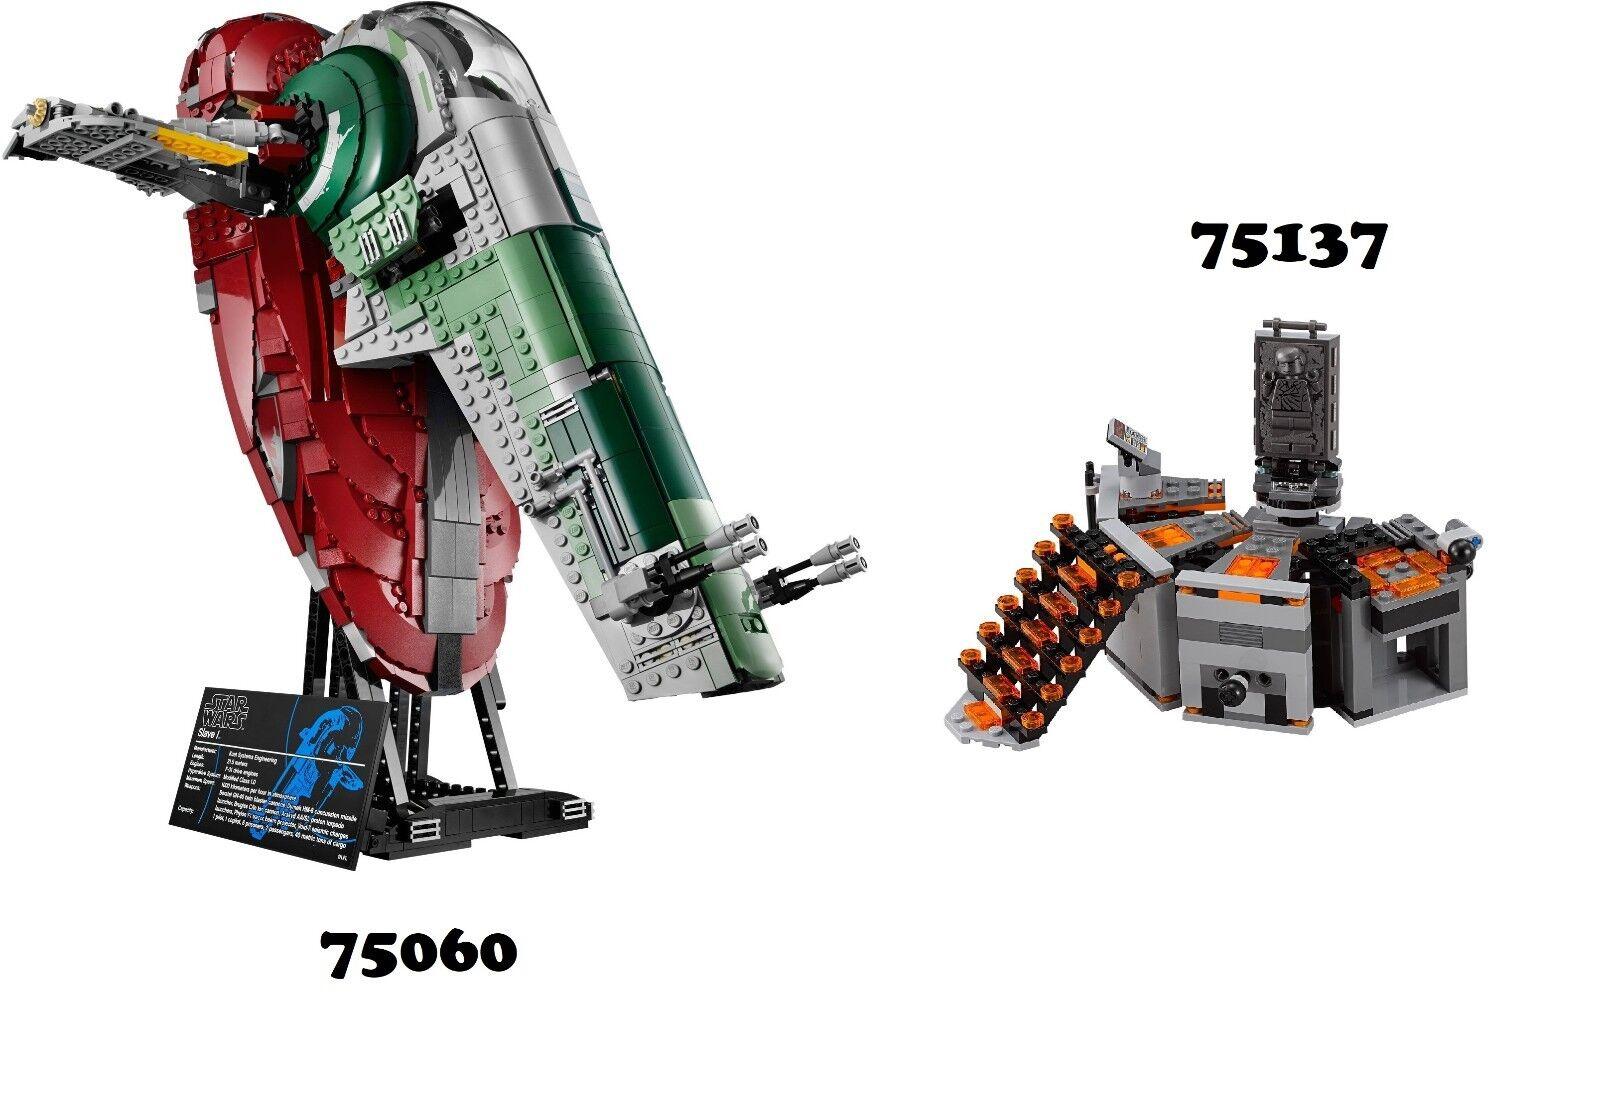 NEW Lego Star Wars 75060 UCS & 75137 Combo Sets NO MINIFIGURES